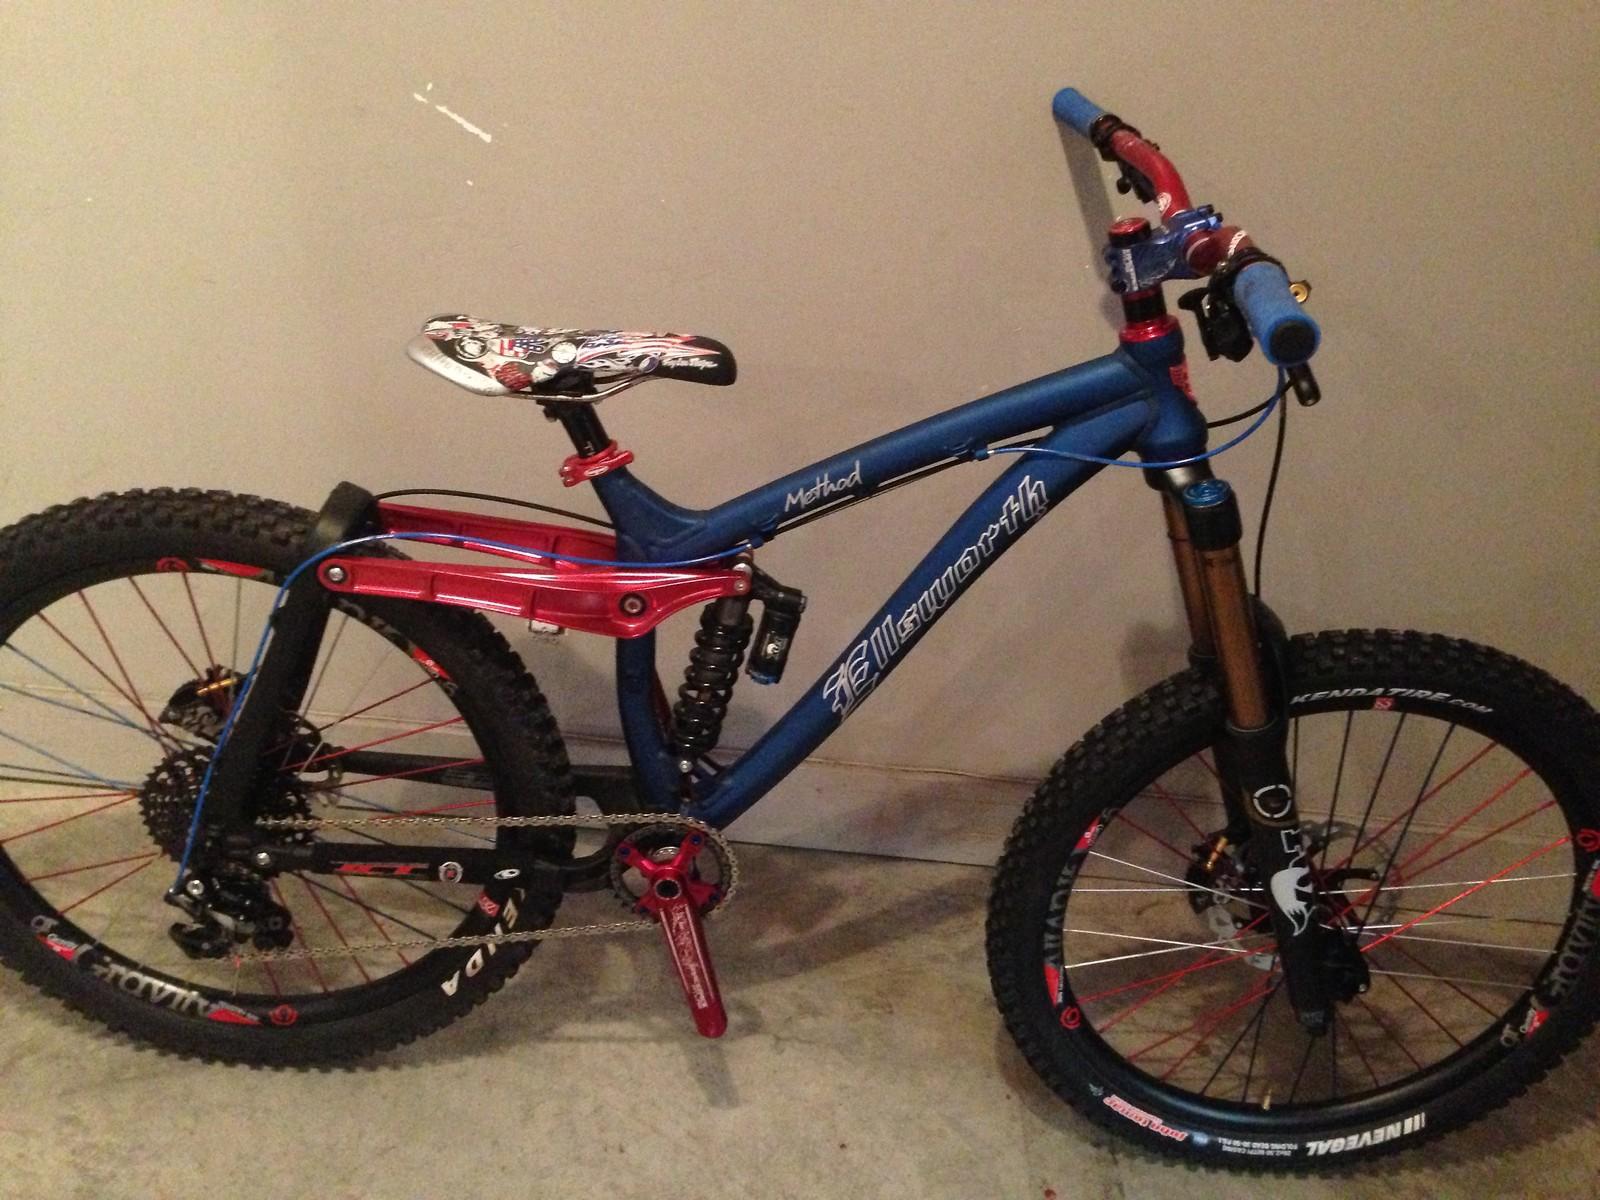 IMG 3058[1] - 1morebike - Mountain Biking Pictures - Vital MTB